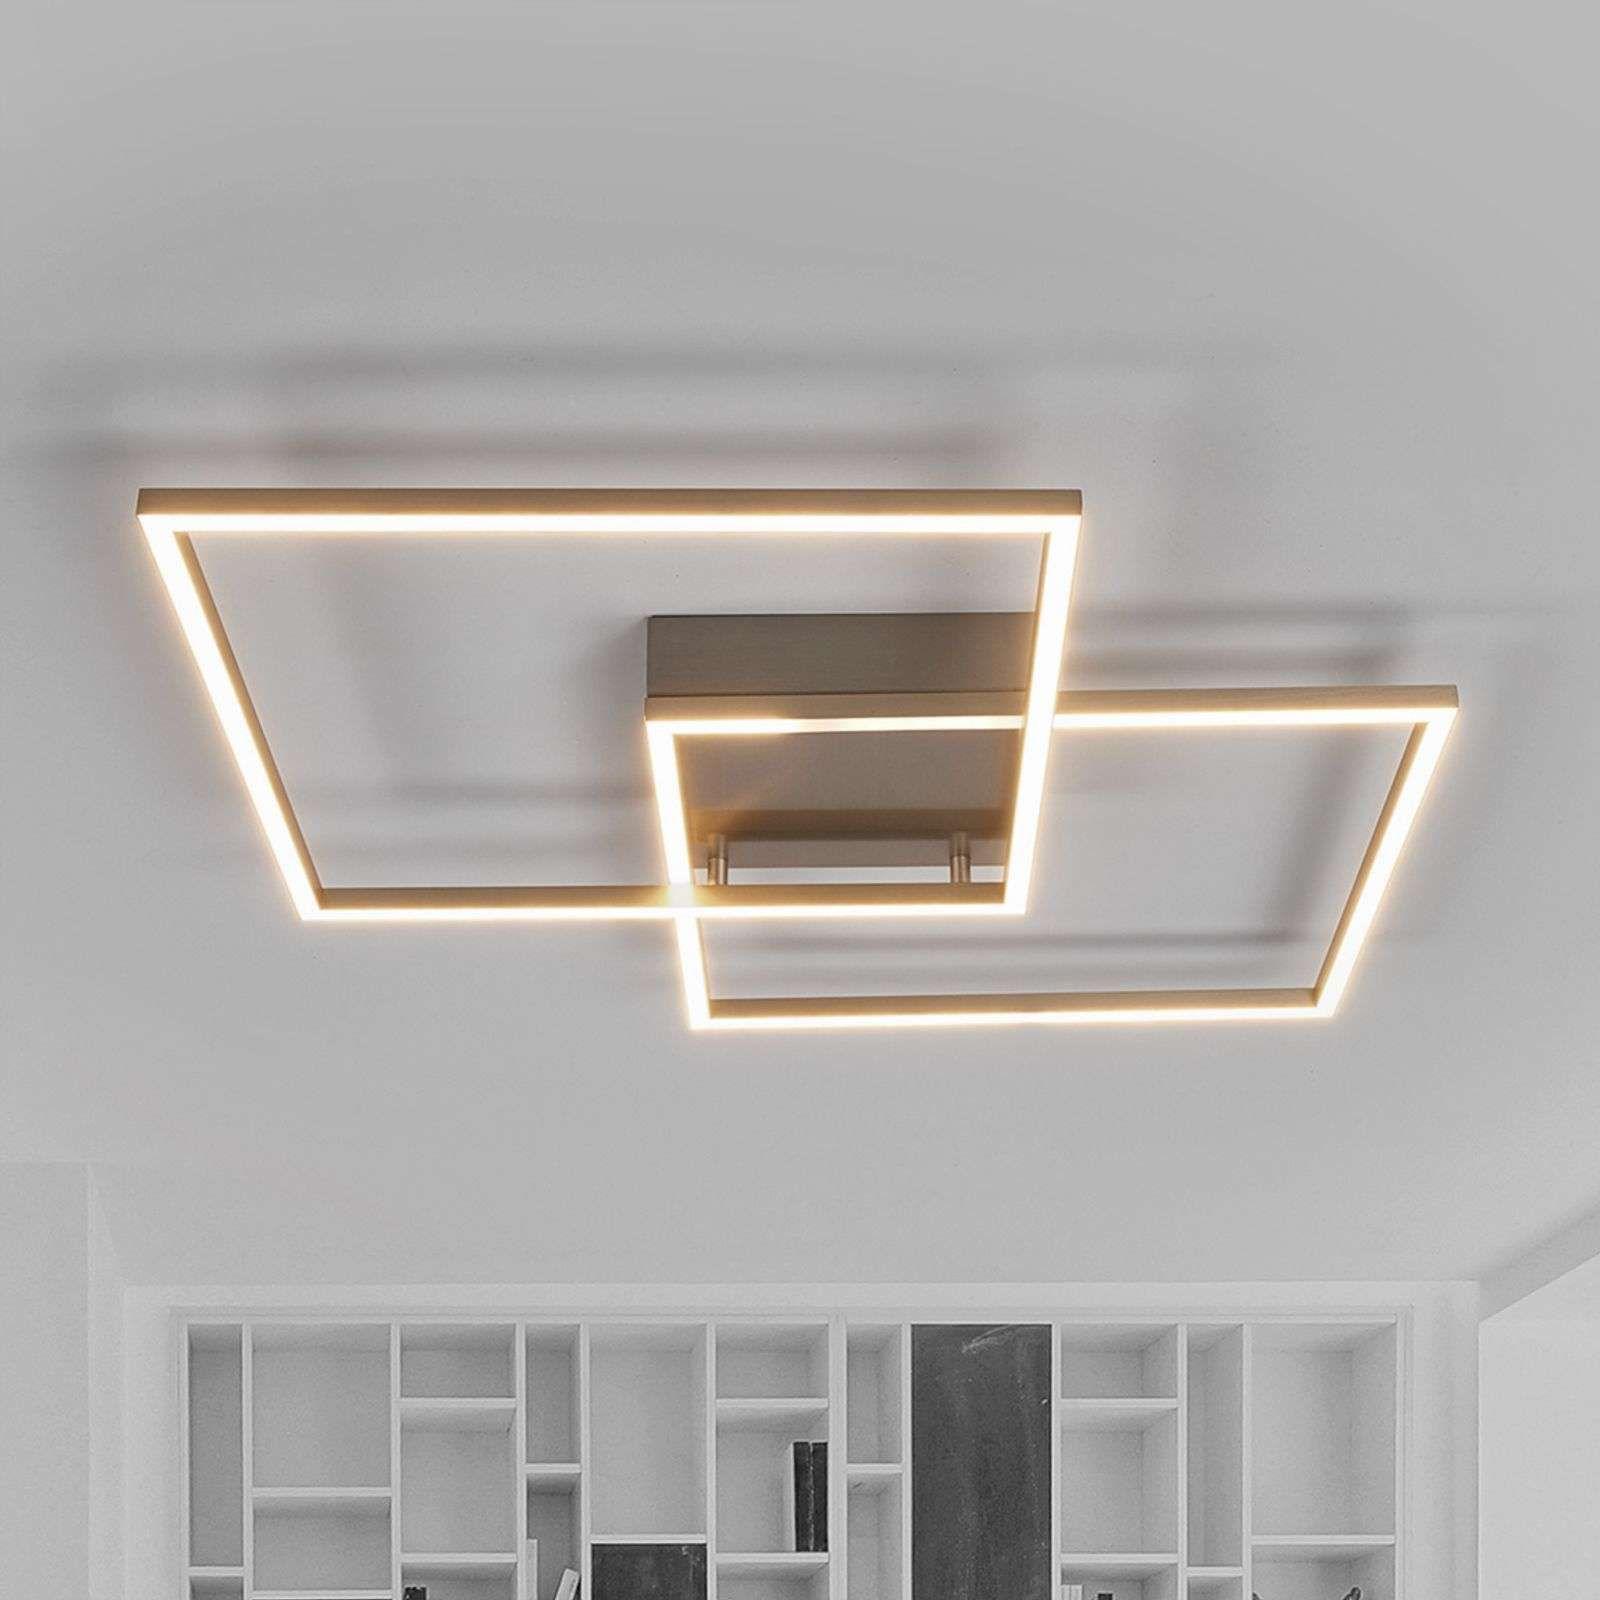 Interestingly Designed Mirac Led Ceiling Lamp In 2020 Led Ceiling Ceiling Lamp Ceiling Light Design